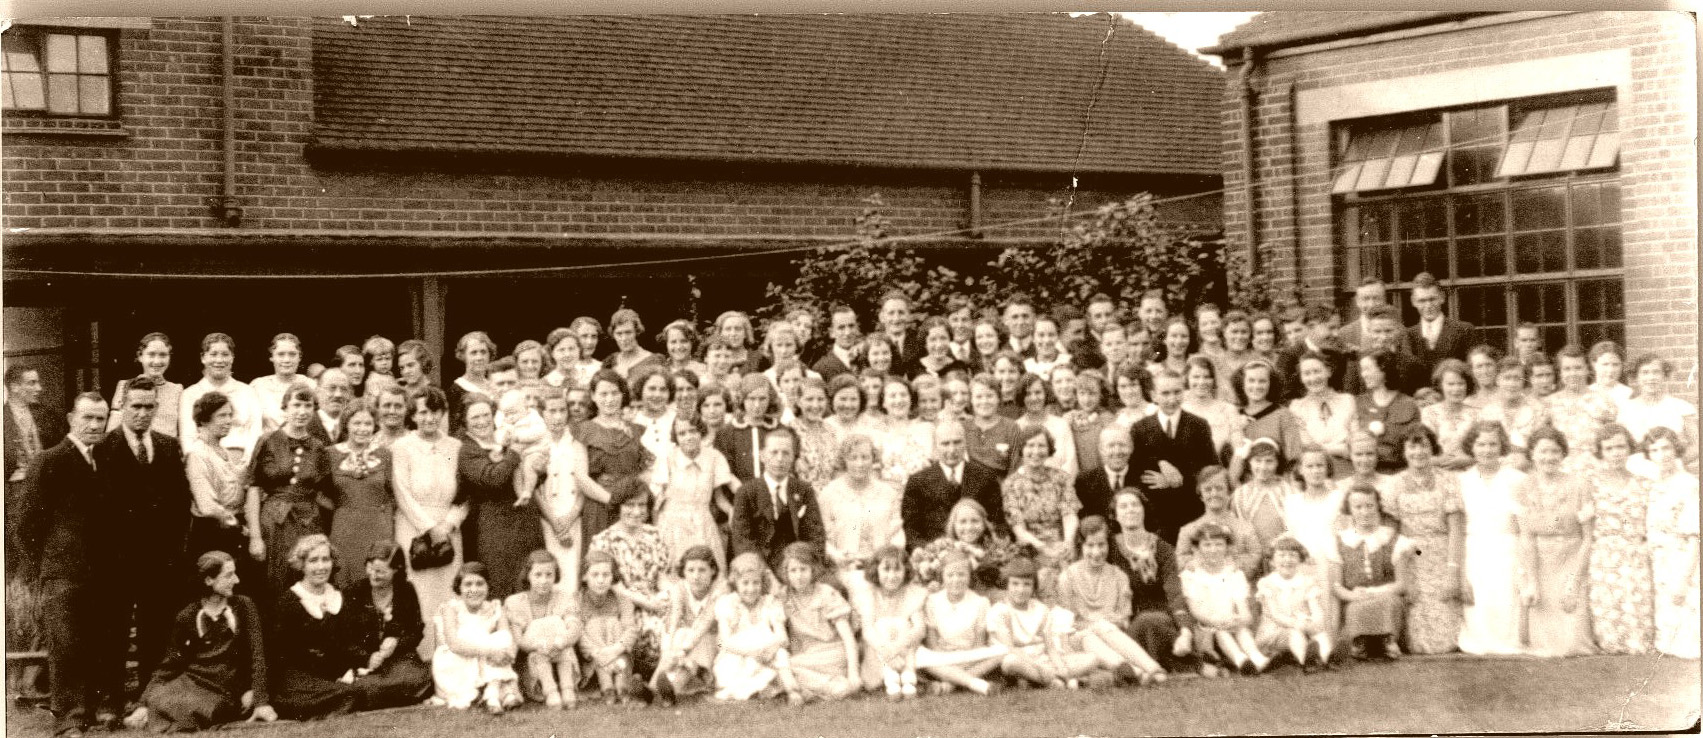 1920s team